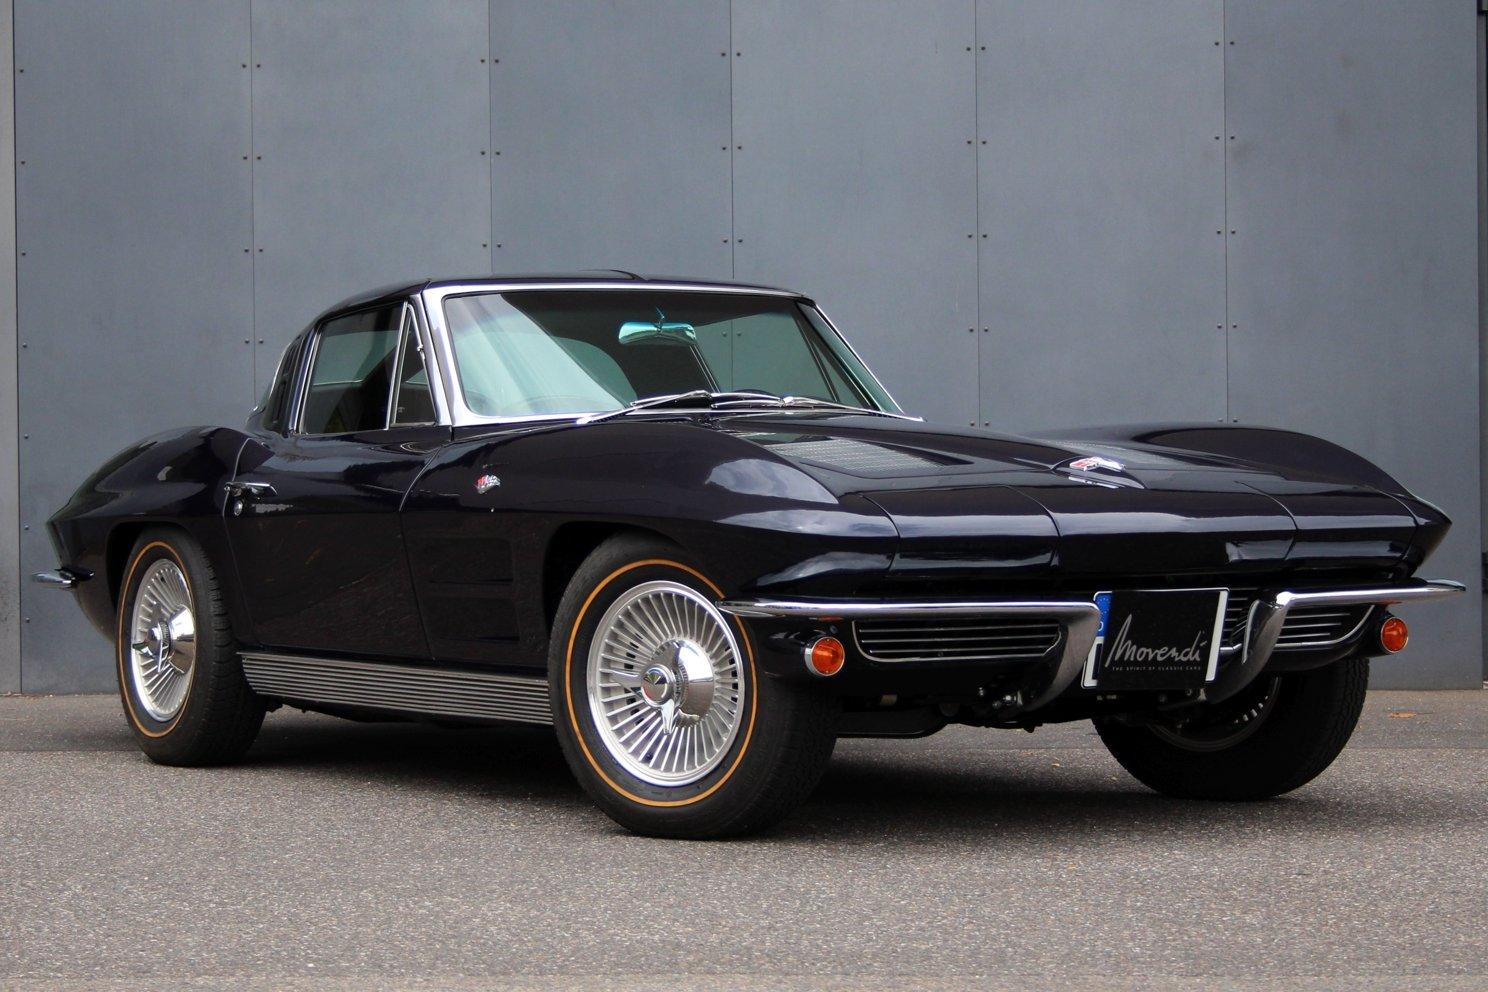 1963 Chevrolet Corvette C2 Stingray Split Window For Sale (picture 1 of 6)